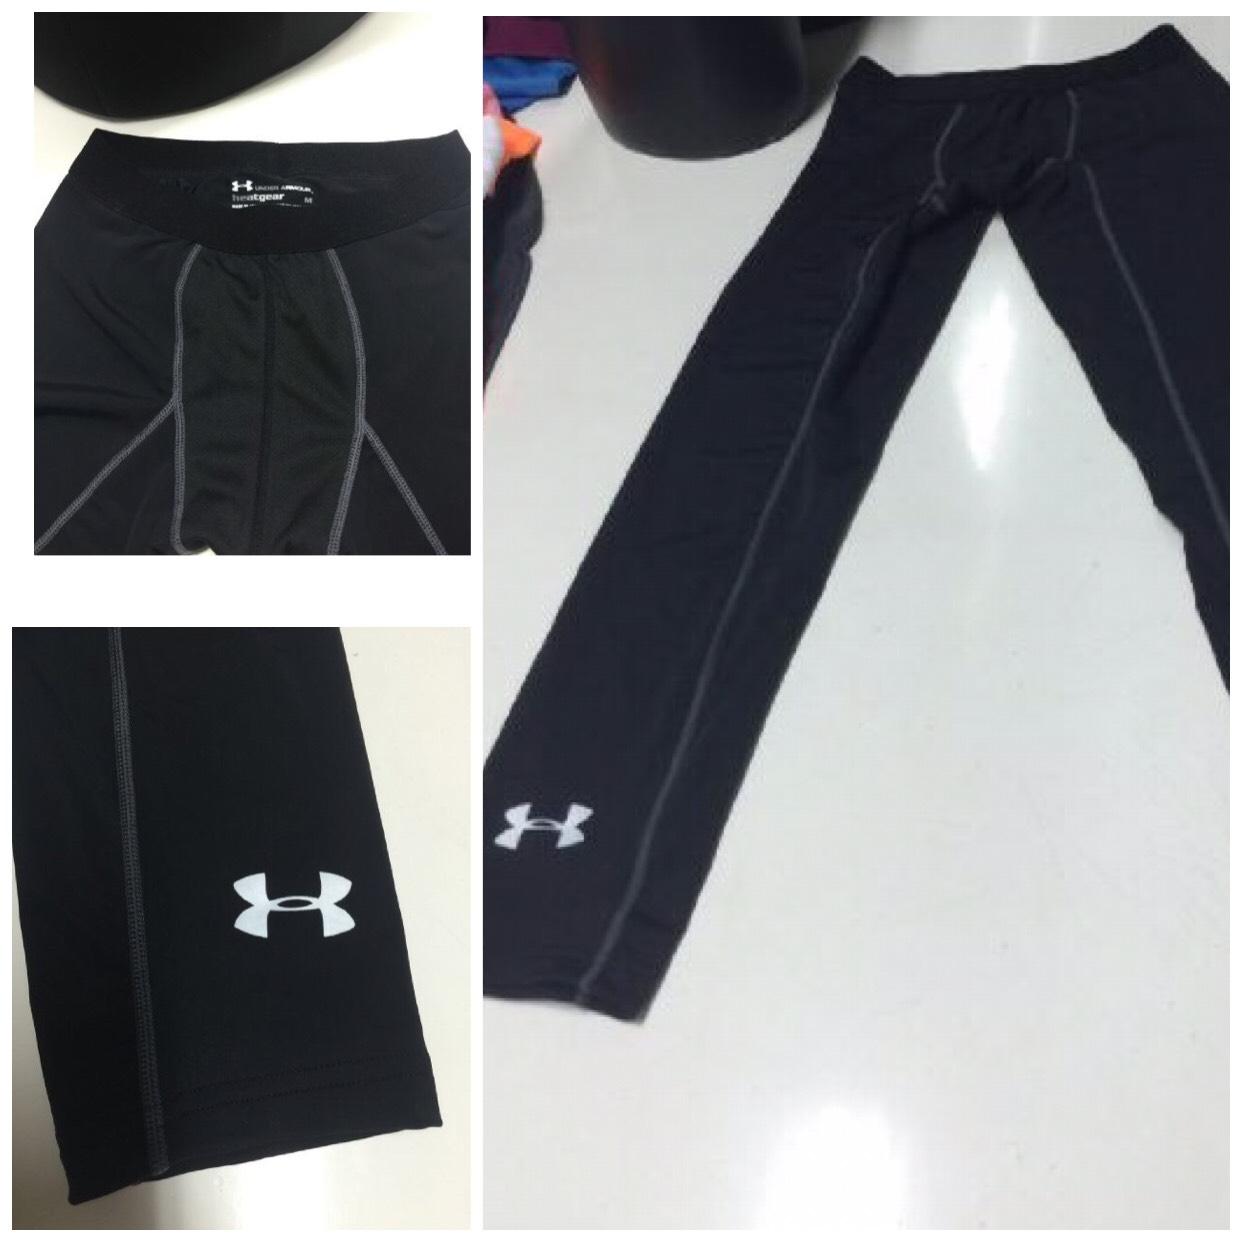 Under Armour Pro Combat Celana Taktikal Panjang Jual Long Pant Leggin Limited Anda Allshop Tokopedia 1242x1242